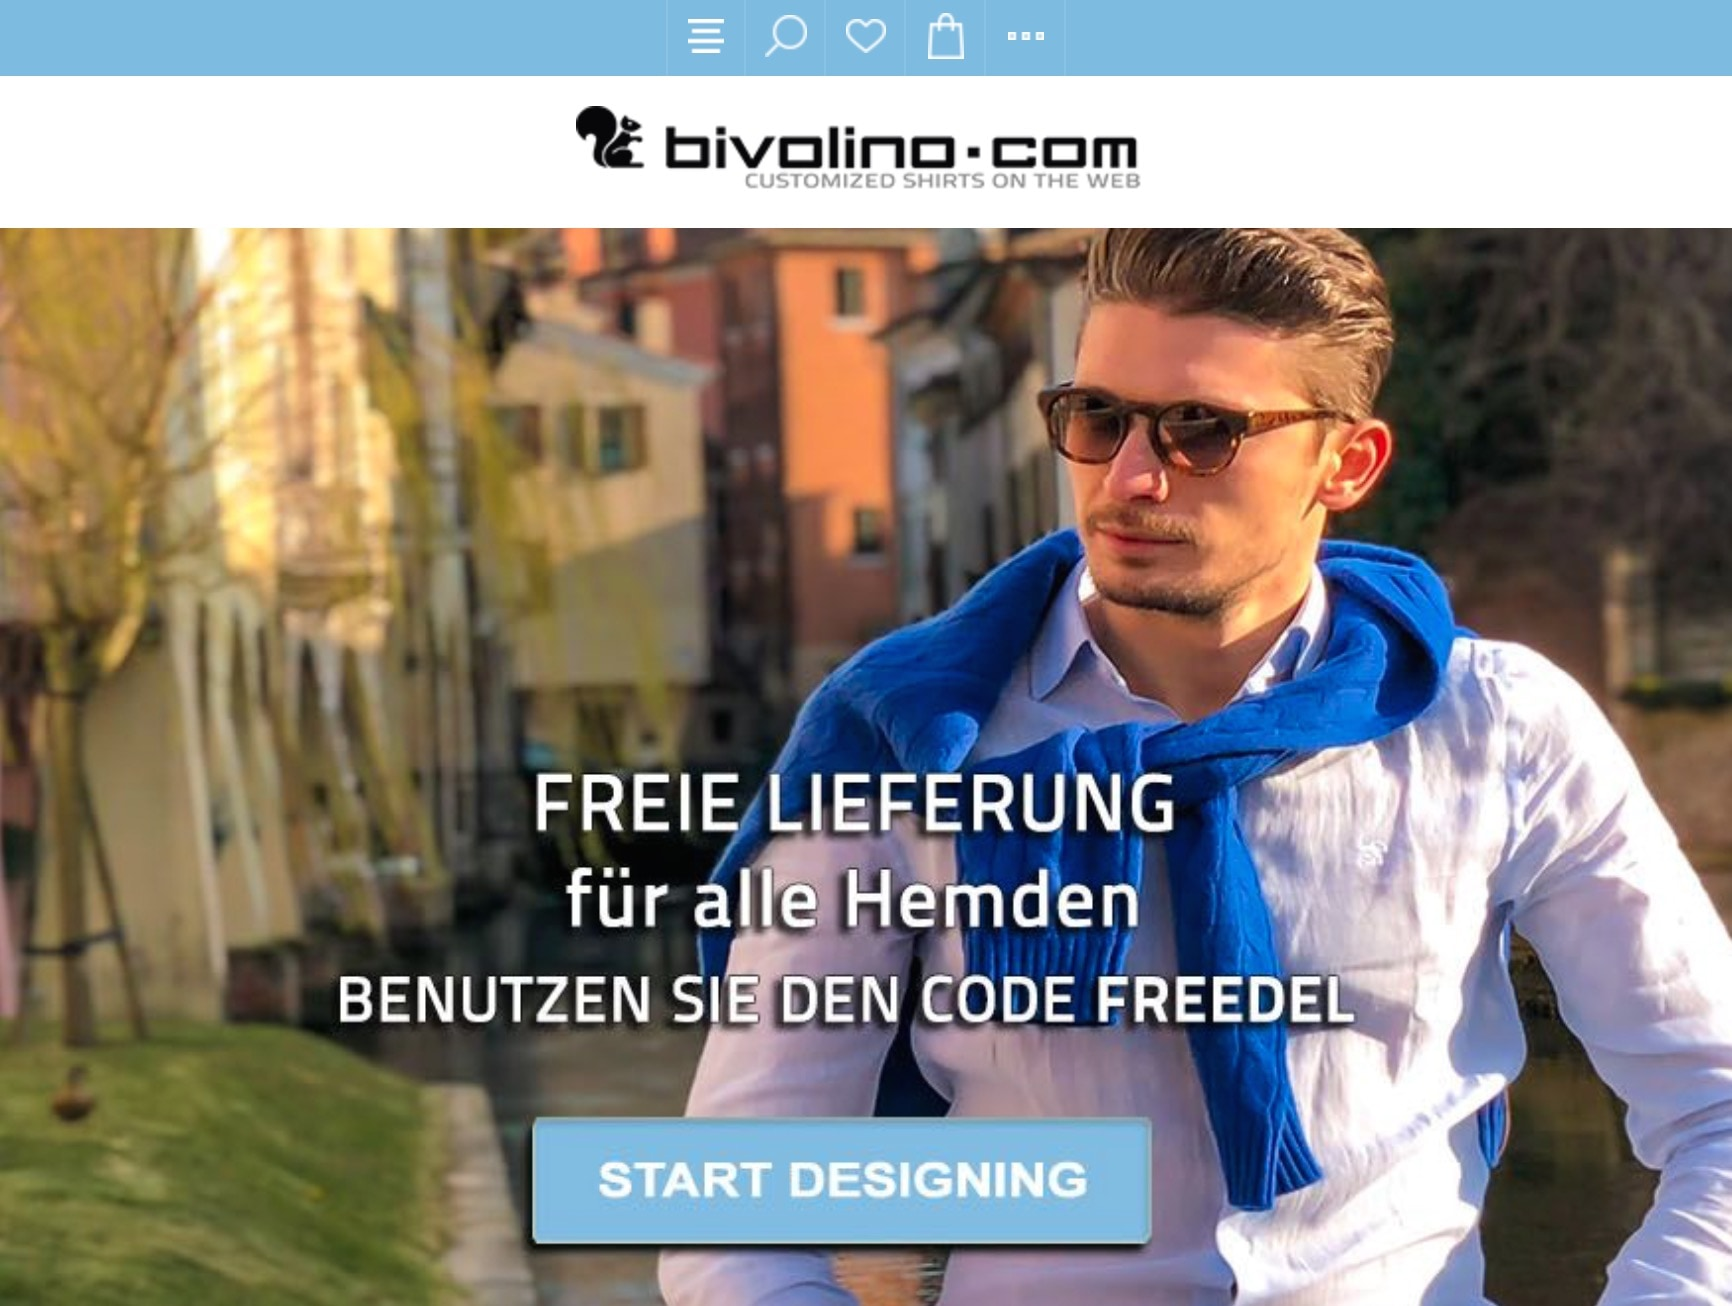 Bivolino Online-Shop